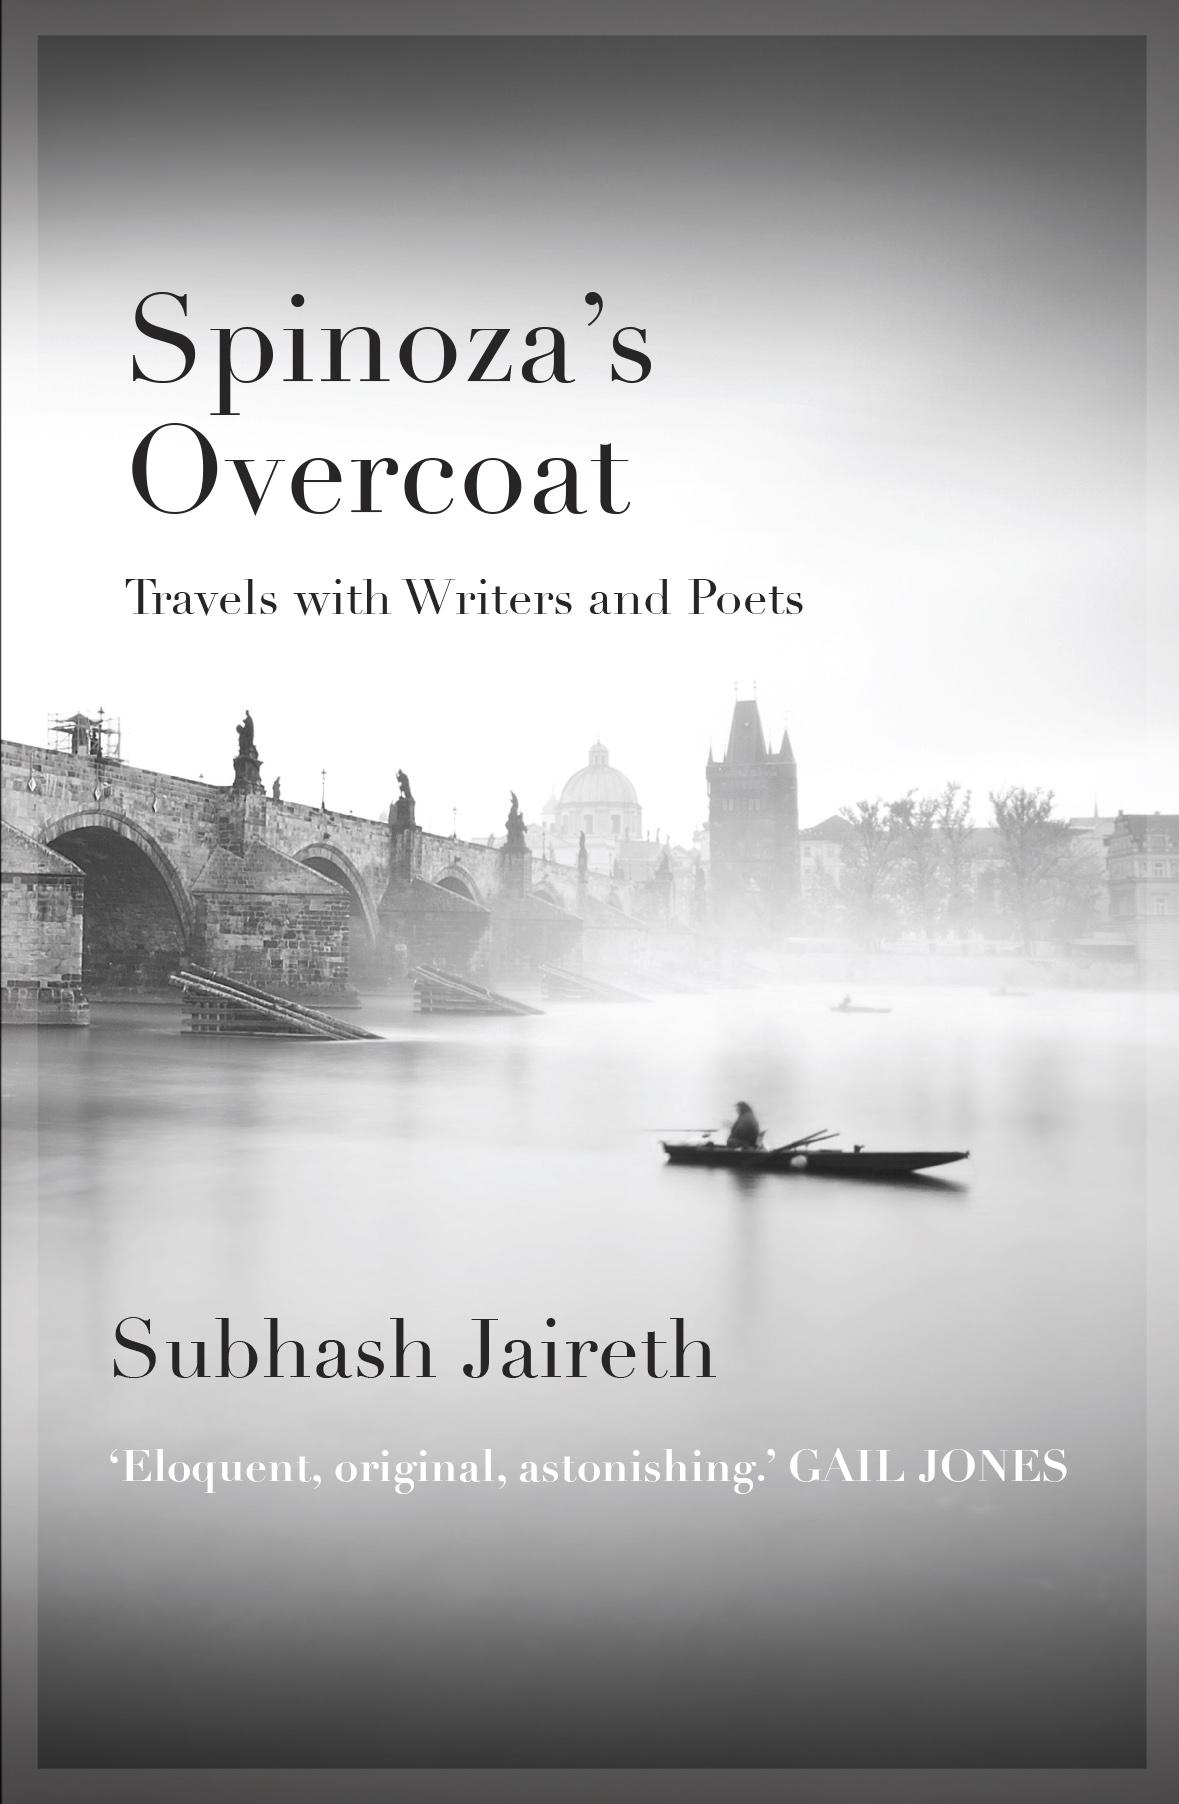 Book Launch: Spinoza's Overcoat